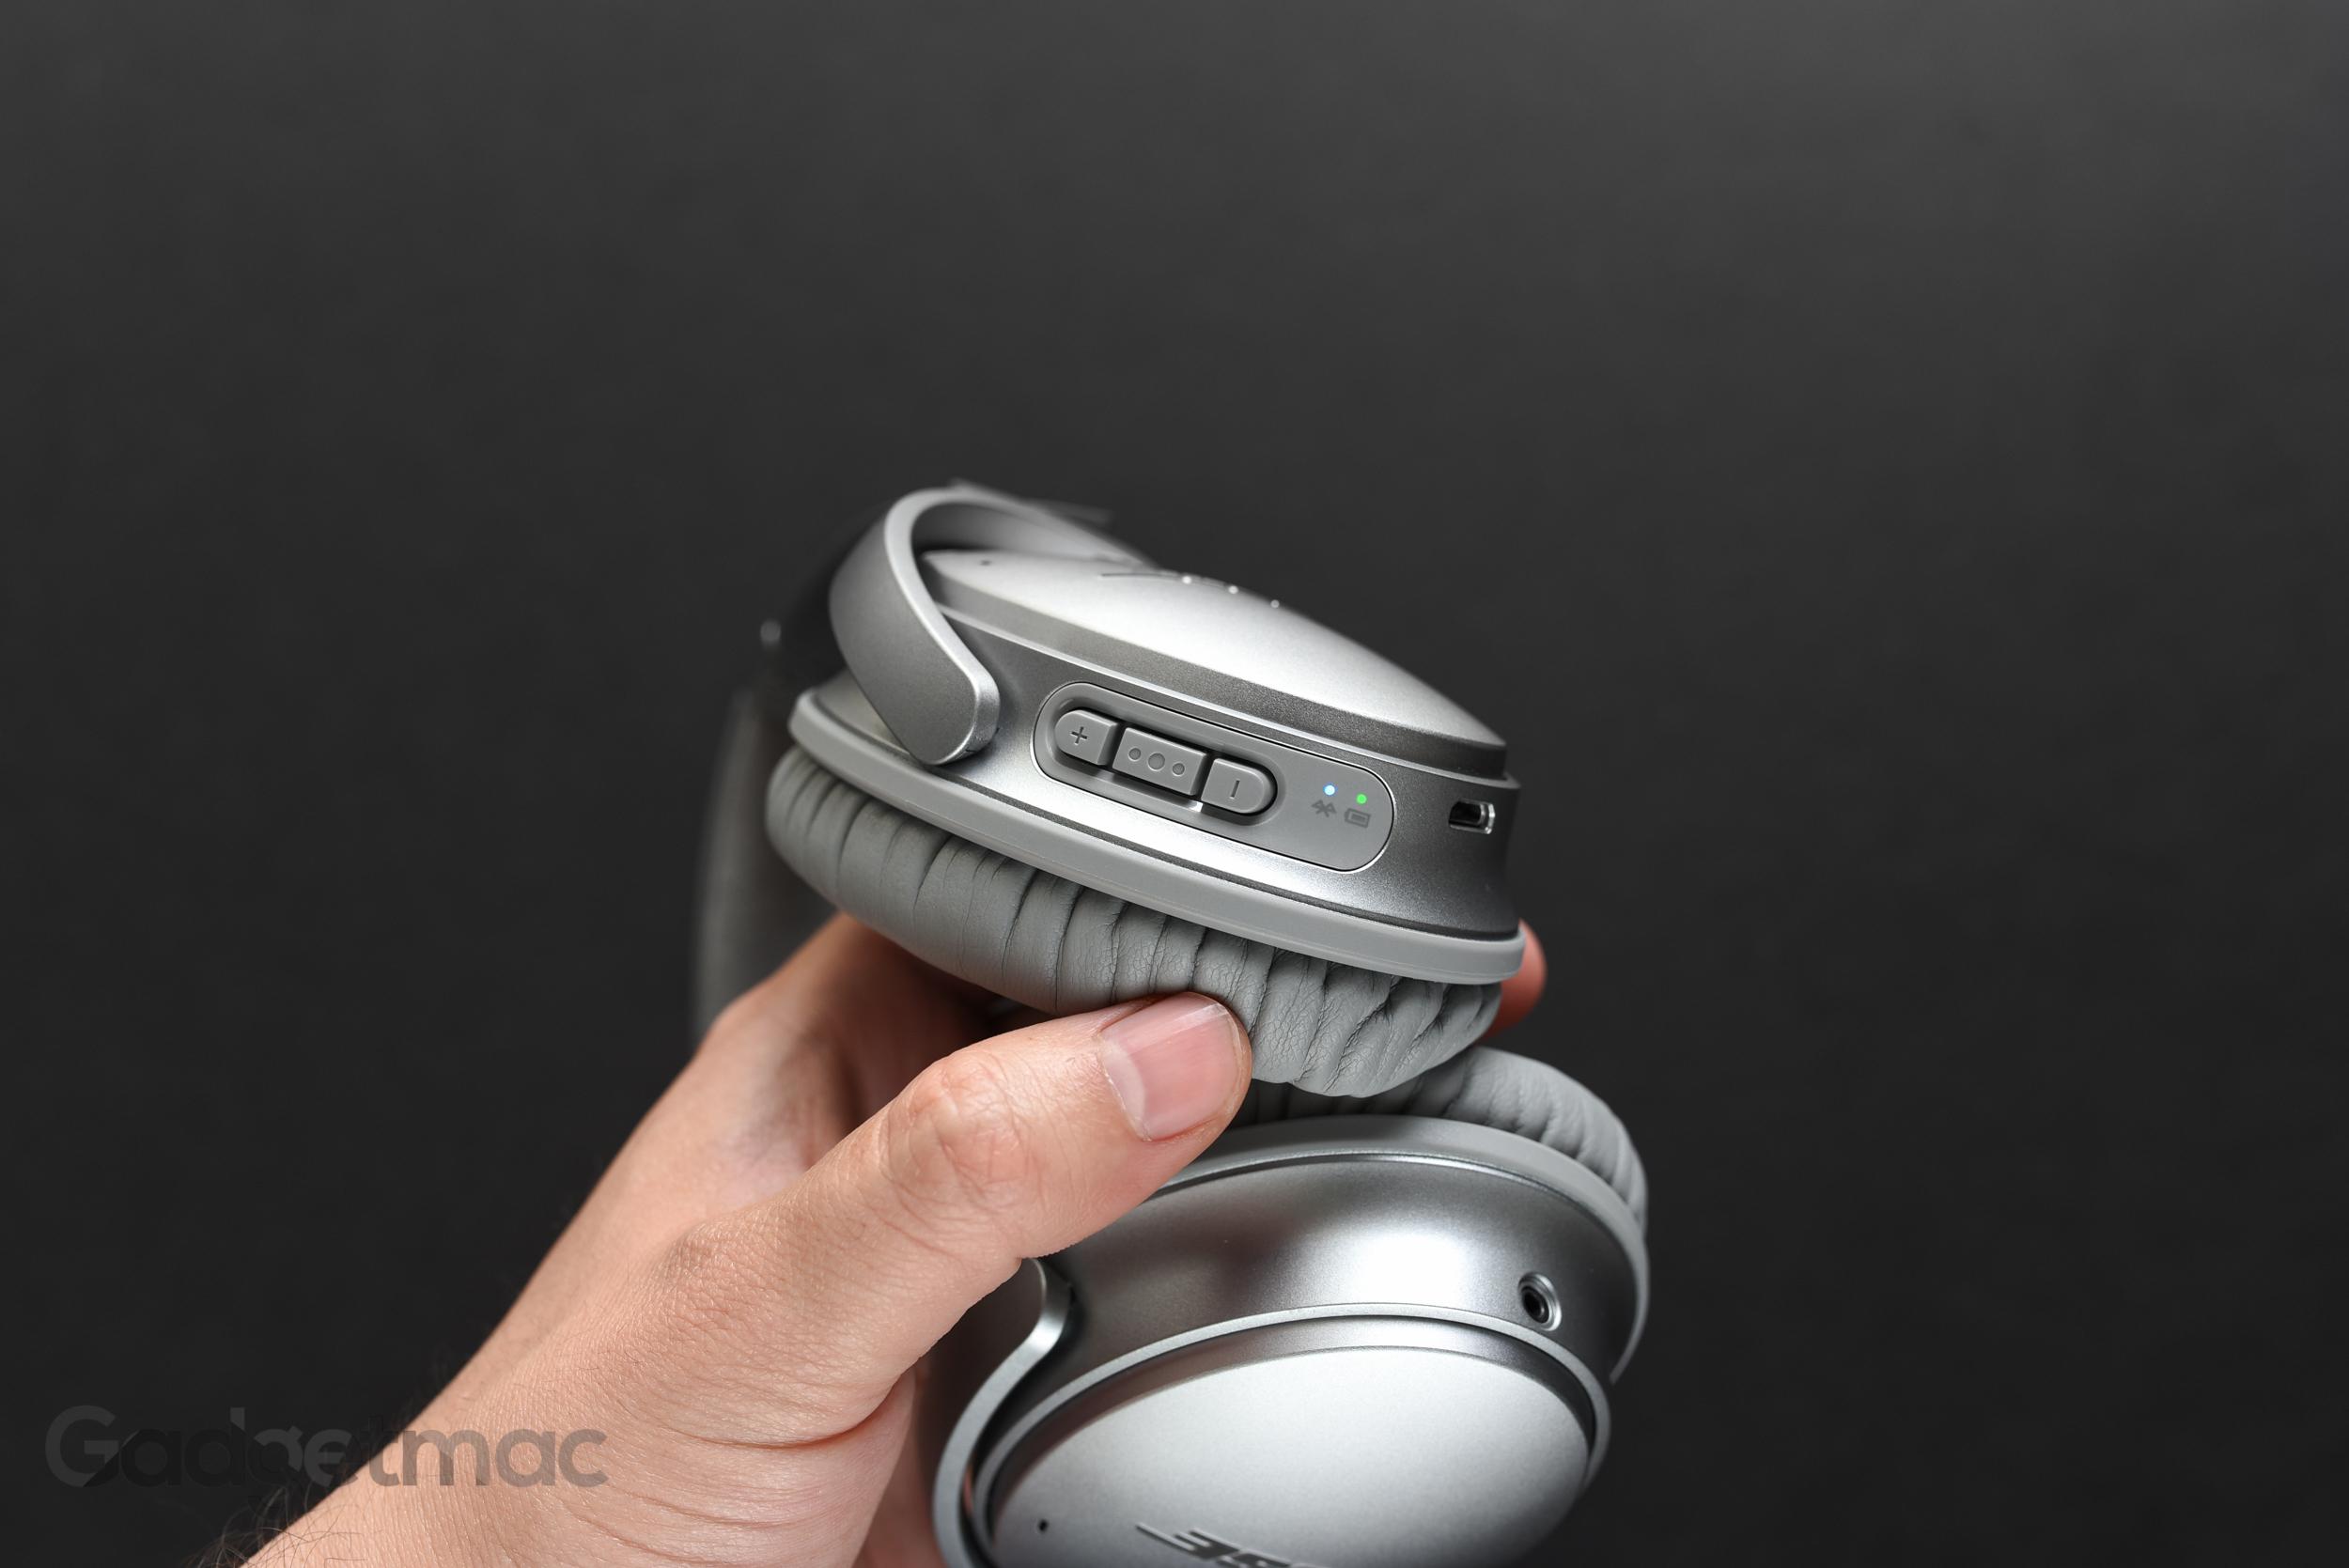 bose-quiet-comfort-35-button-controls.jpg